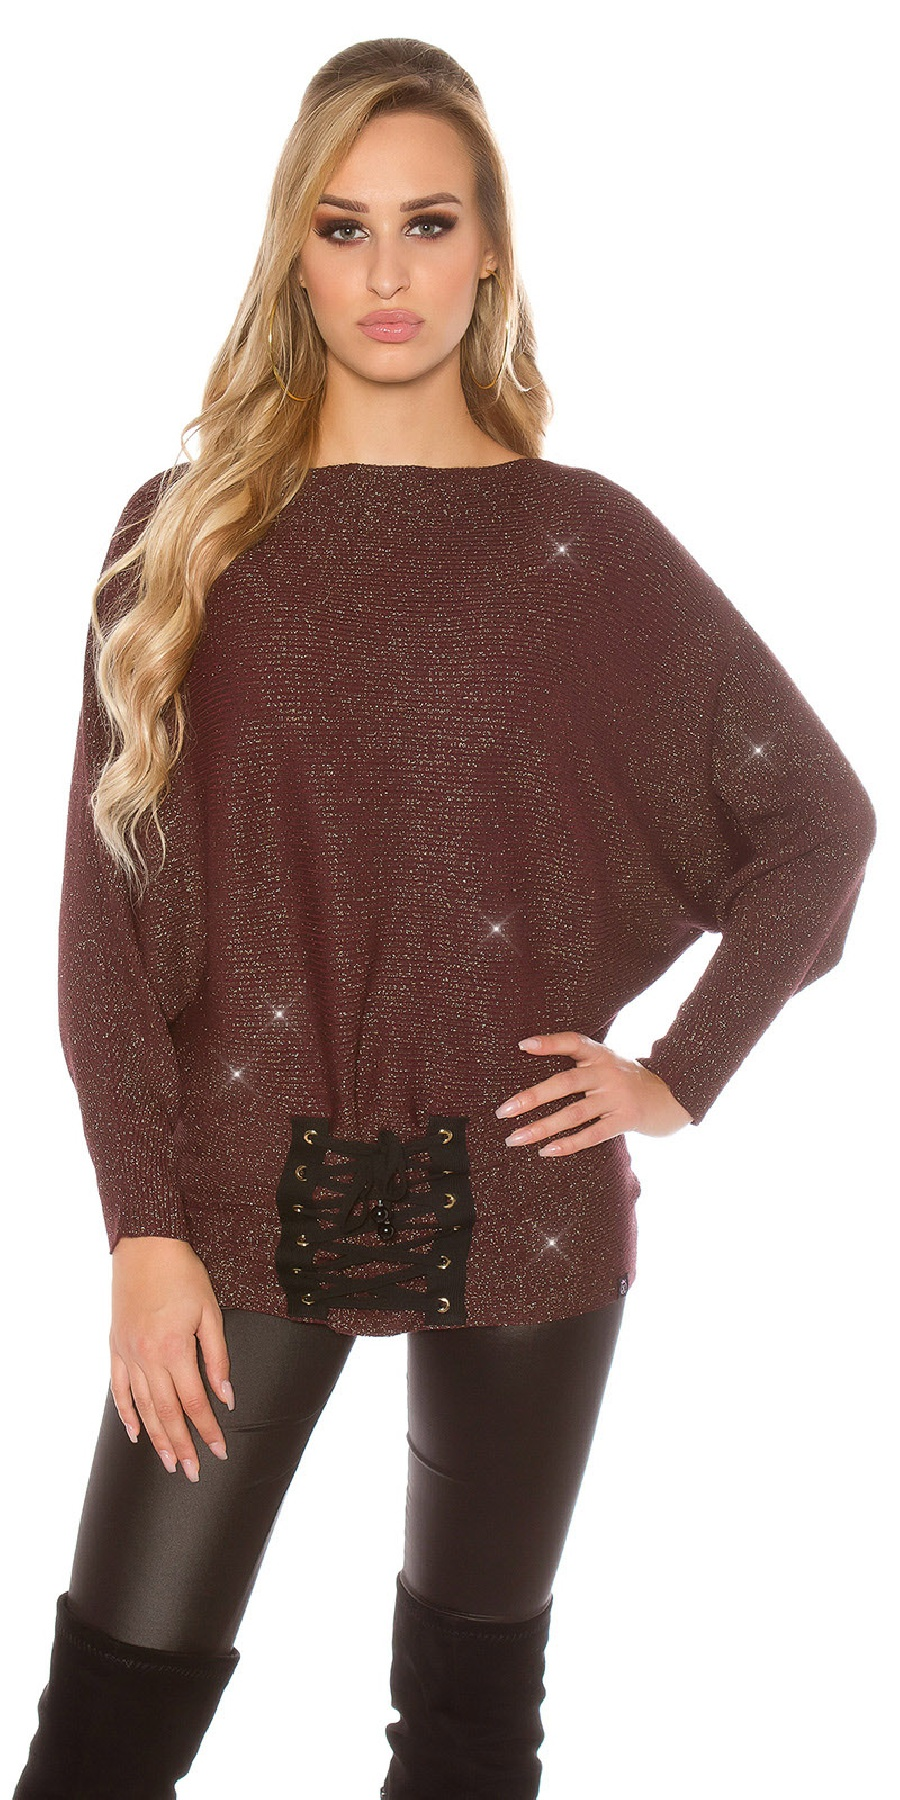 Top tendance fashion avec strass TF35108 couleur rose